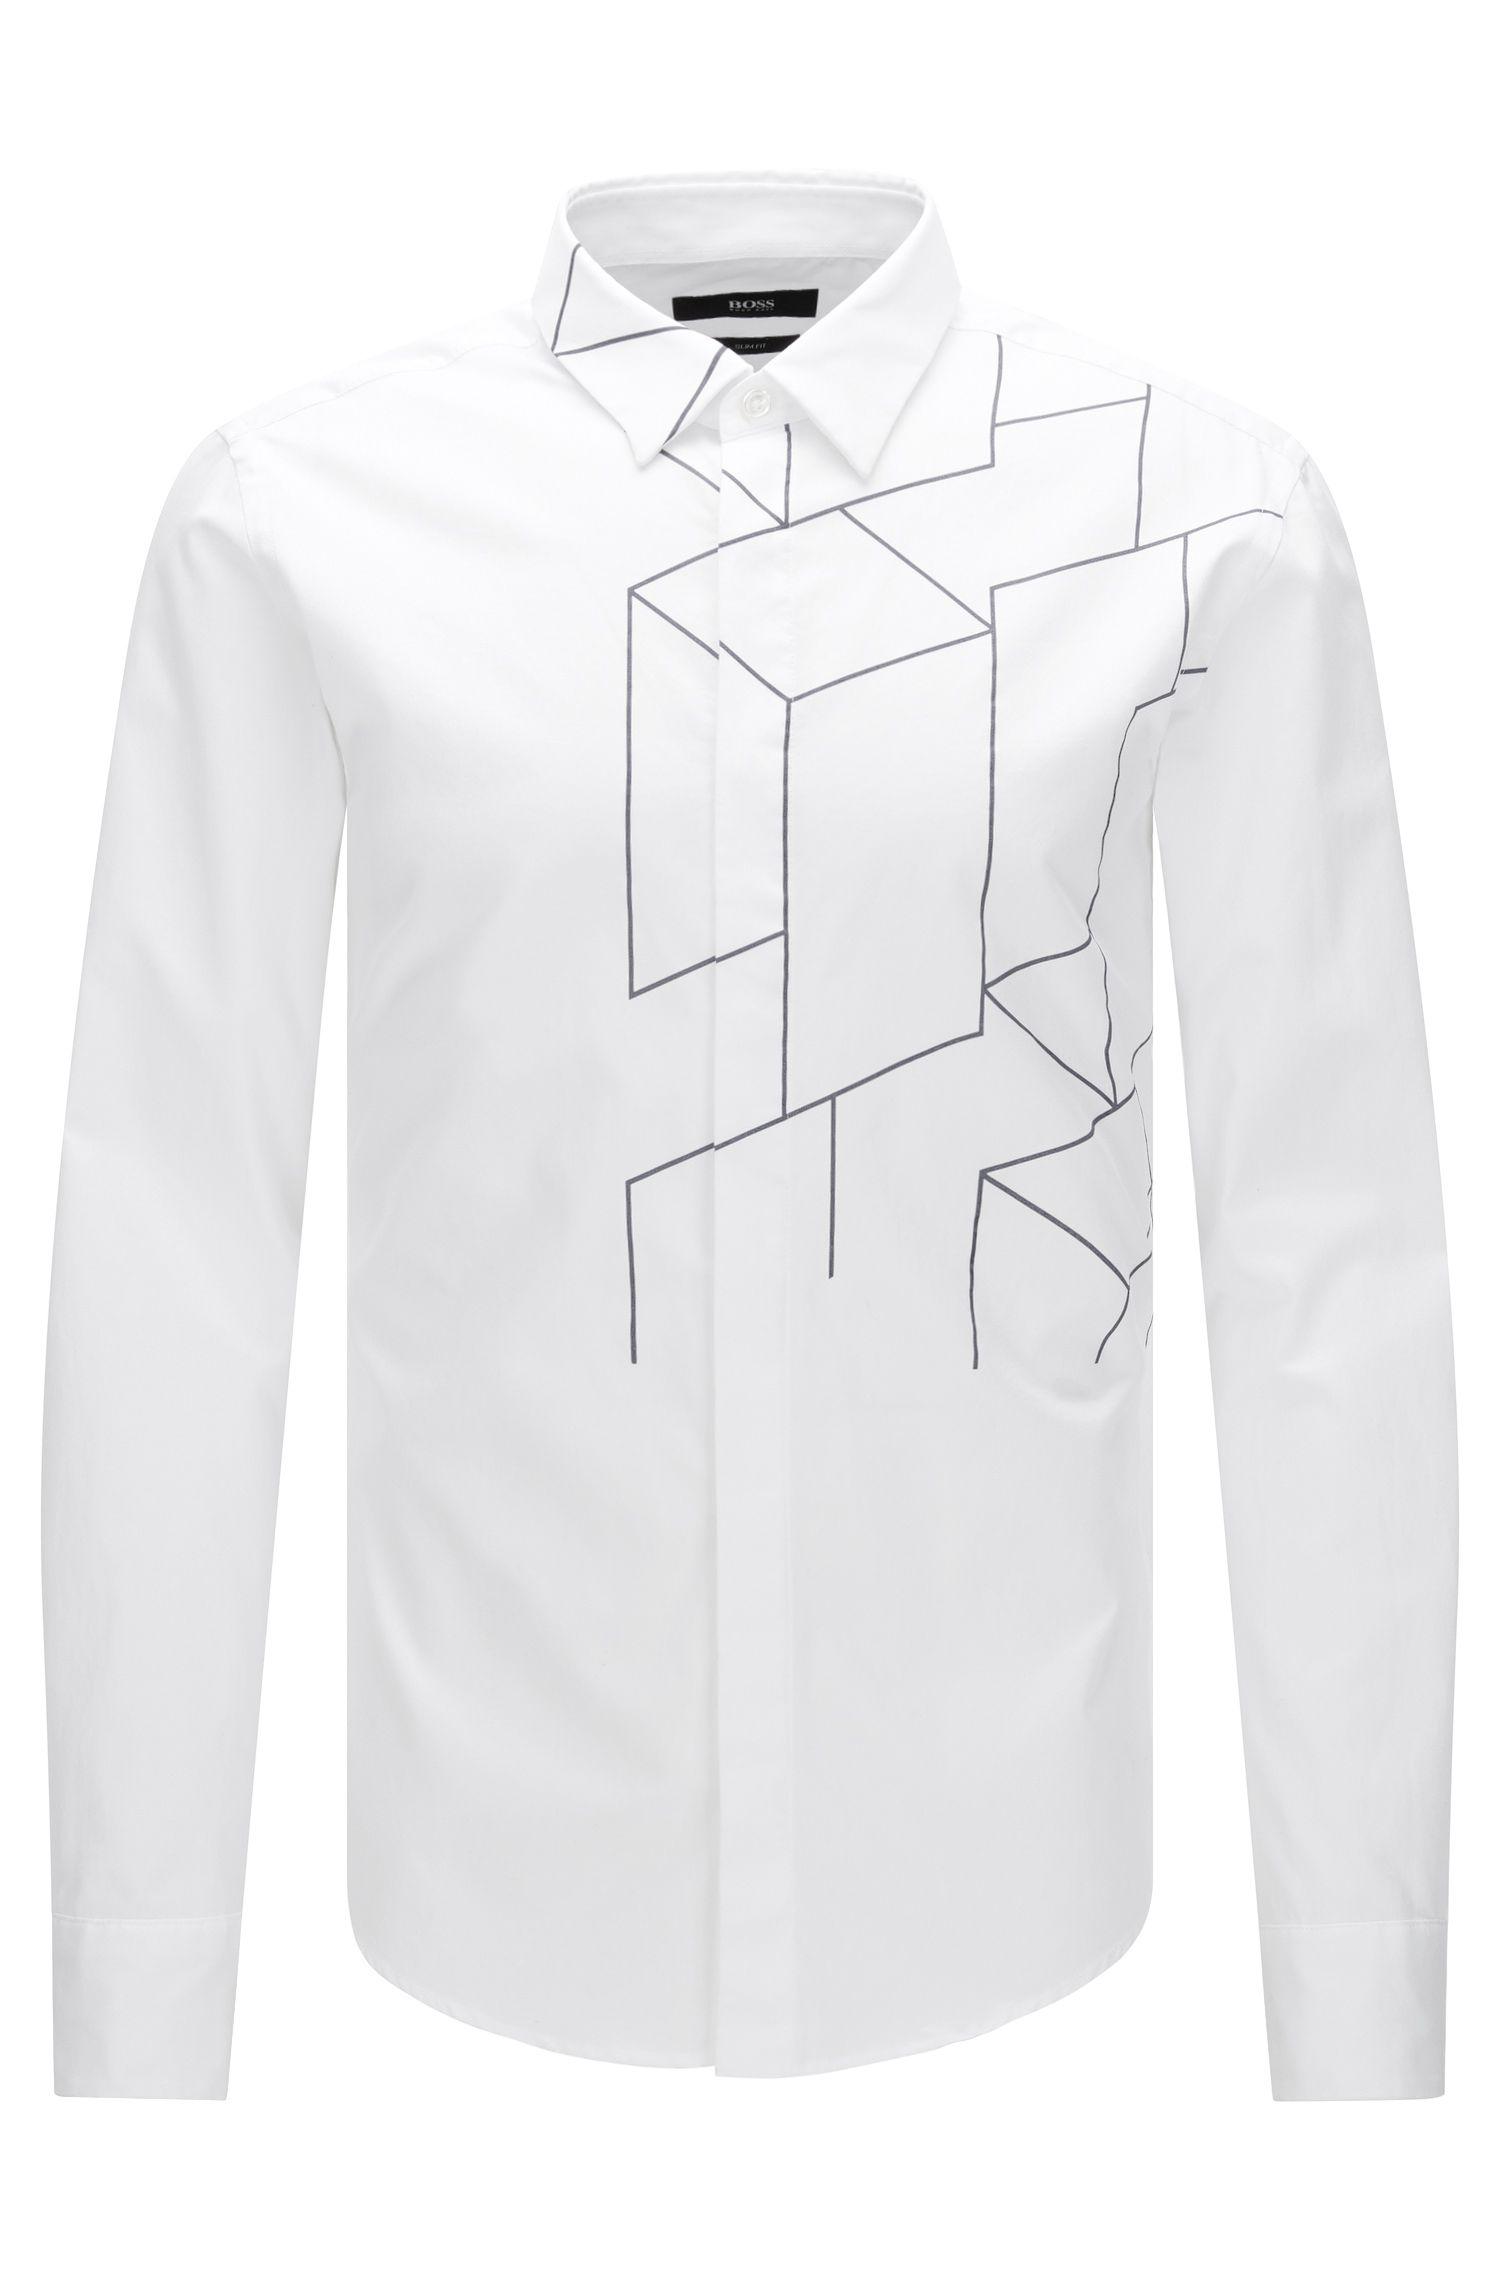 Slim-Fit Hemd aus Baumwolle mit Linien-Muster: 'Reid_FH'